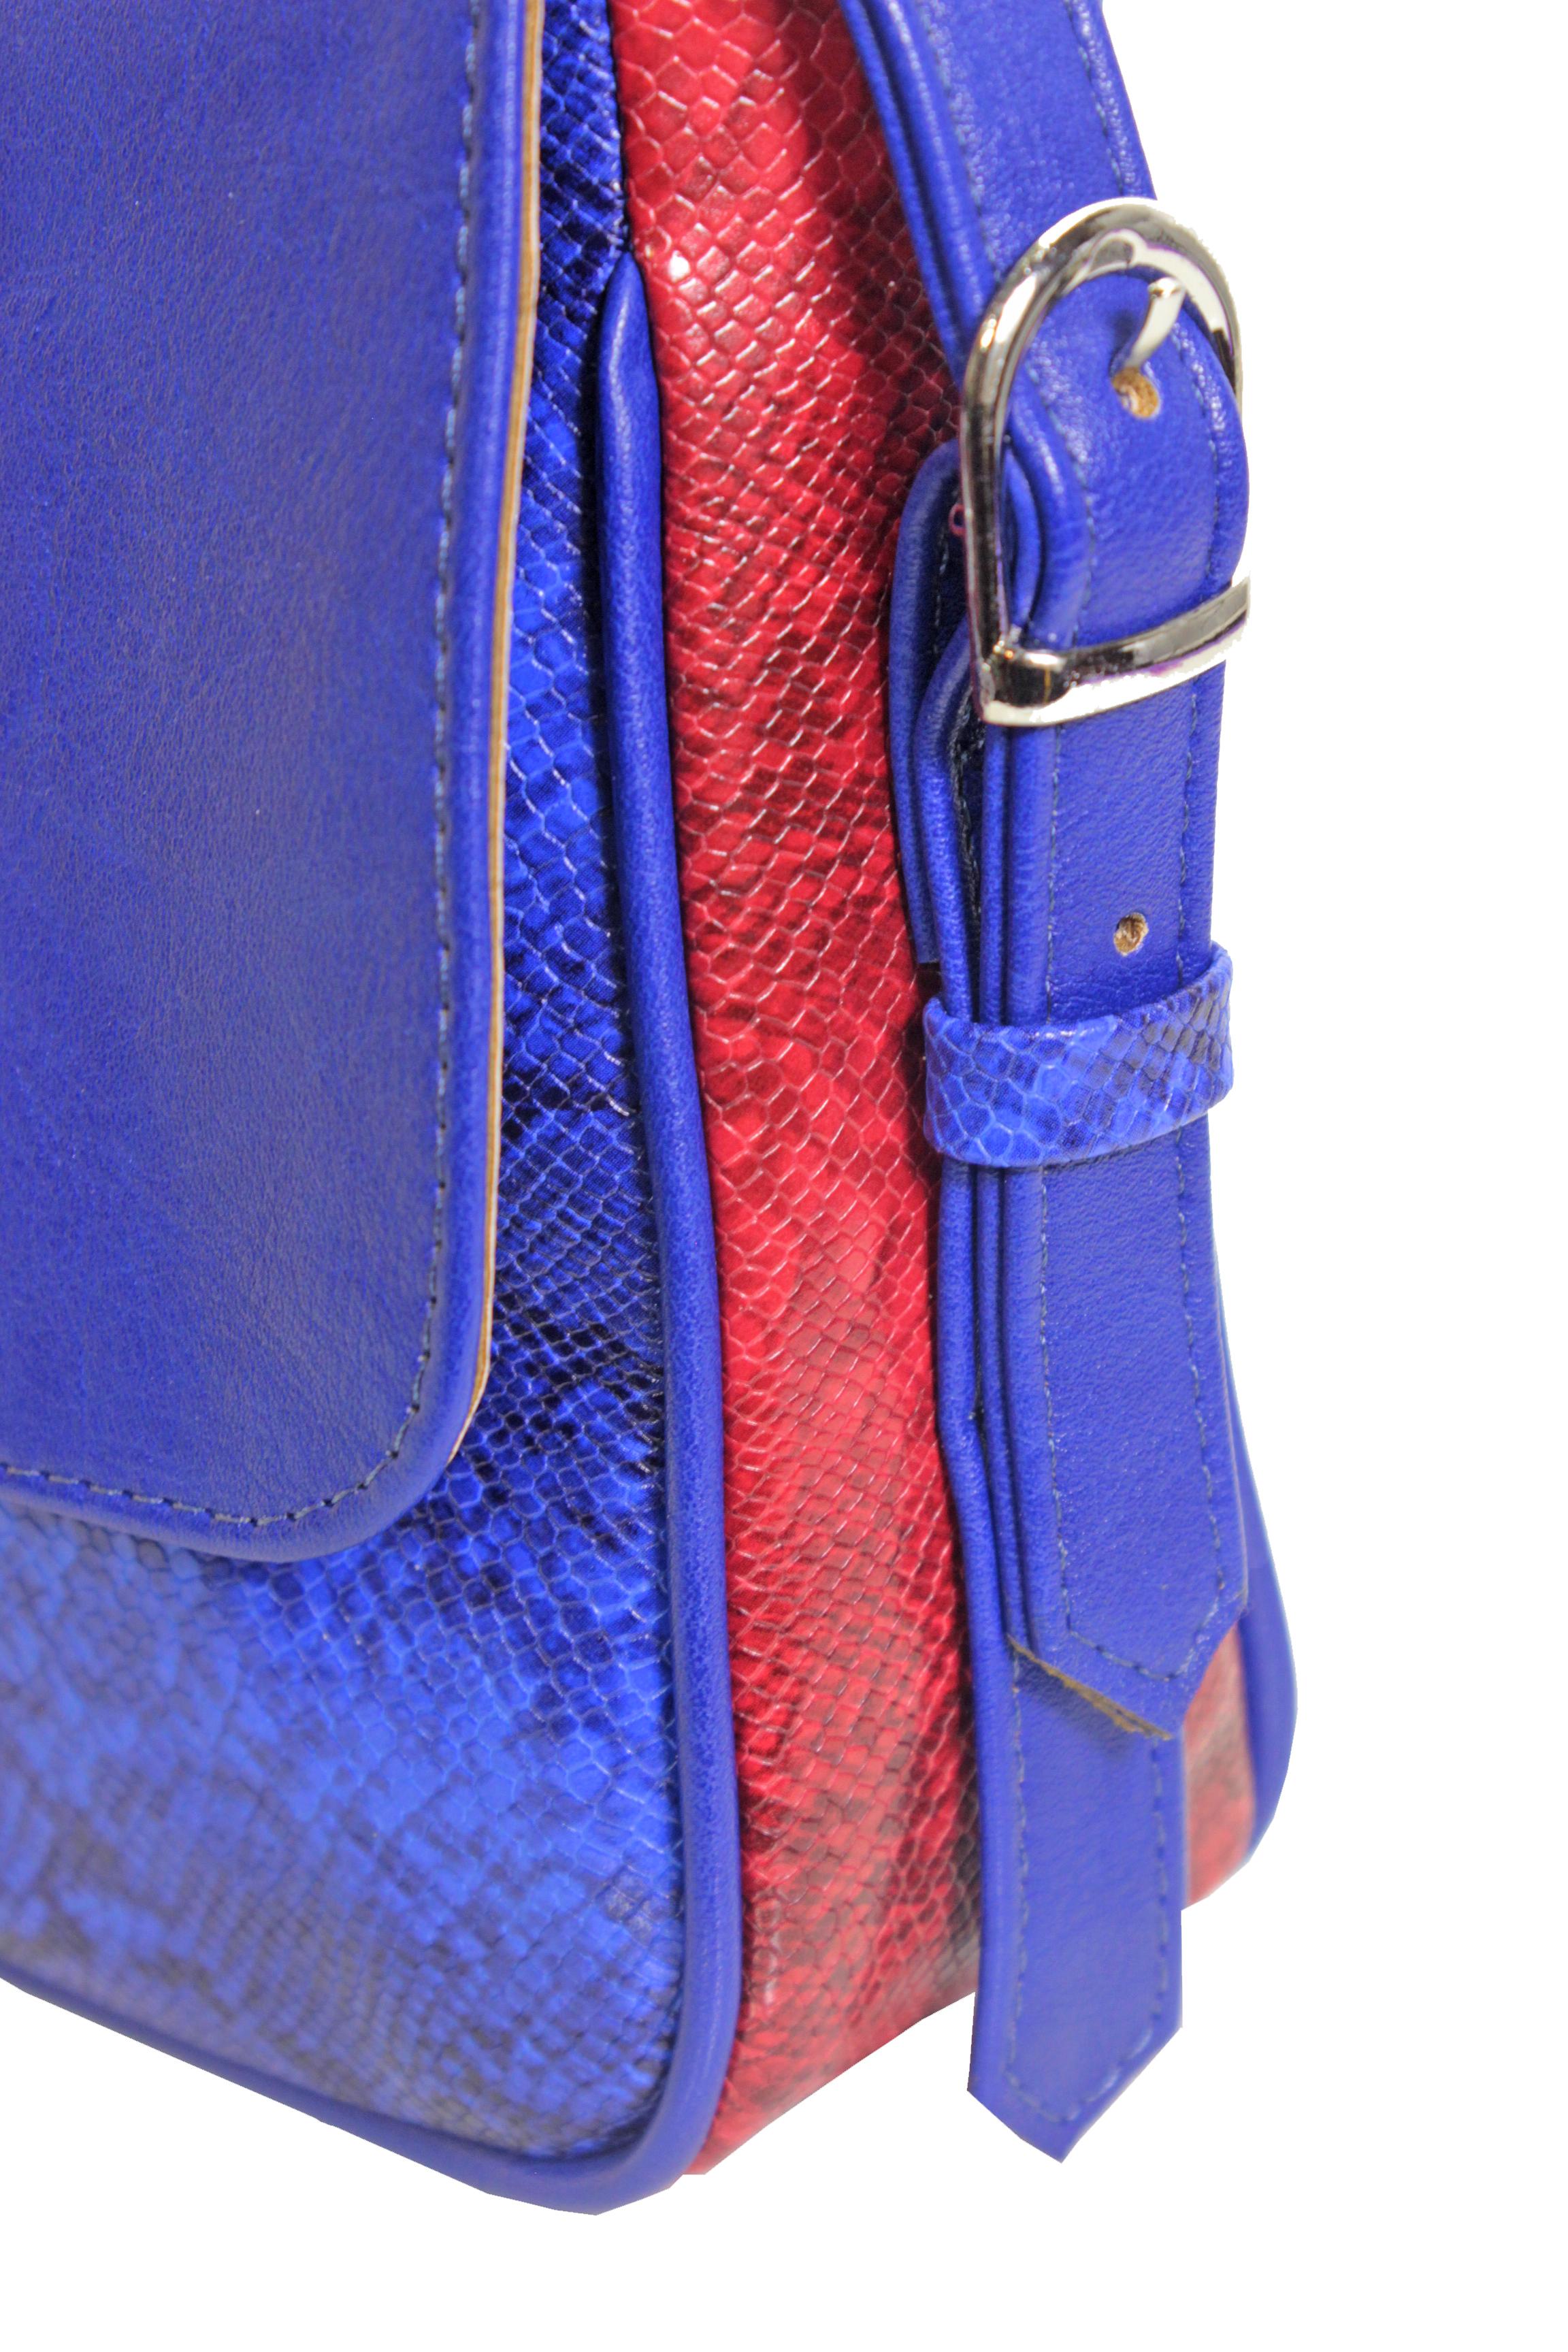 Crossbody kabelka s hadím vzorem 11-10245-blue-snake - detail